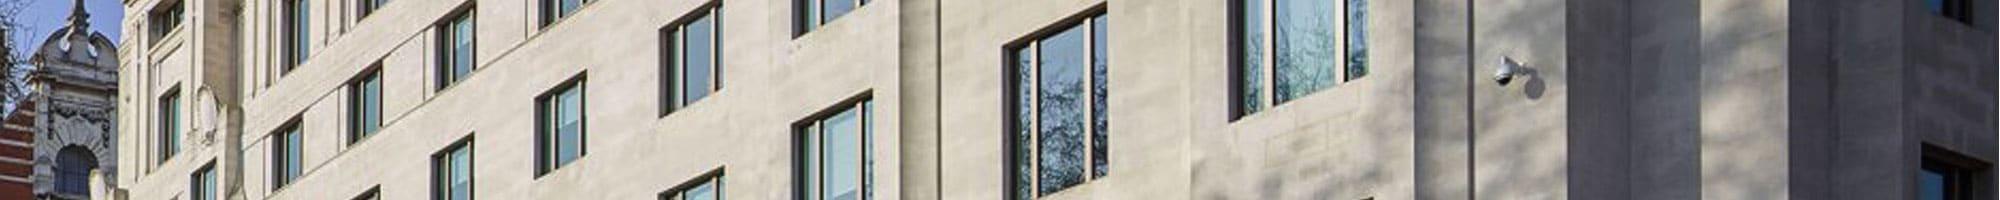 Cemplas - Banner - Basements & Waterproofing - Image 2